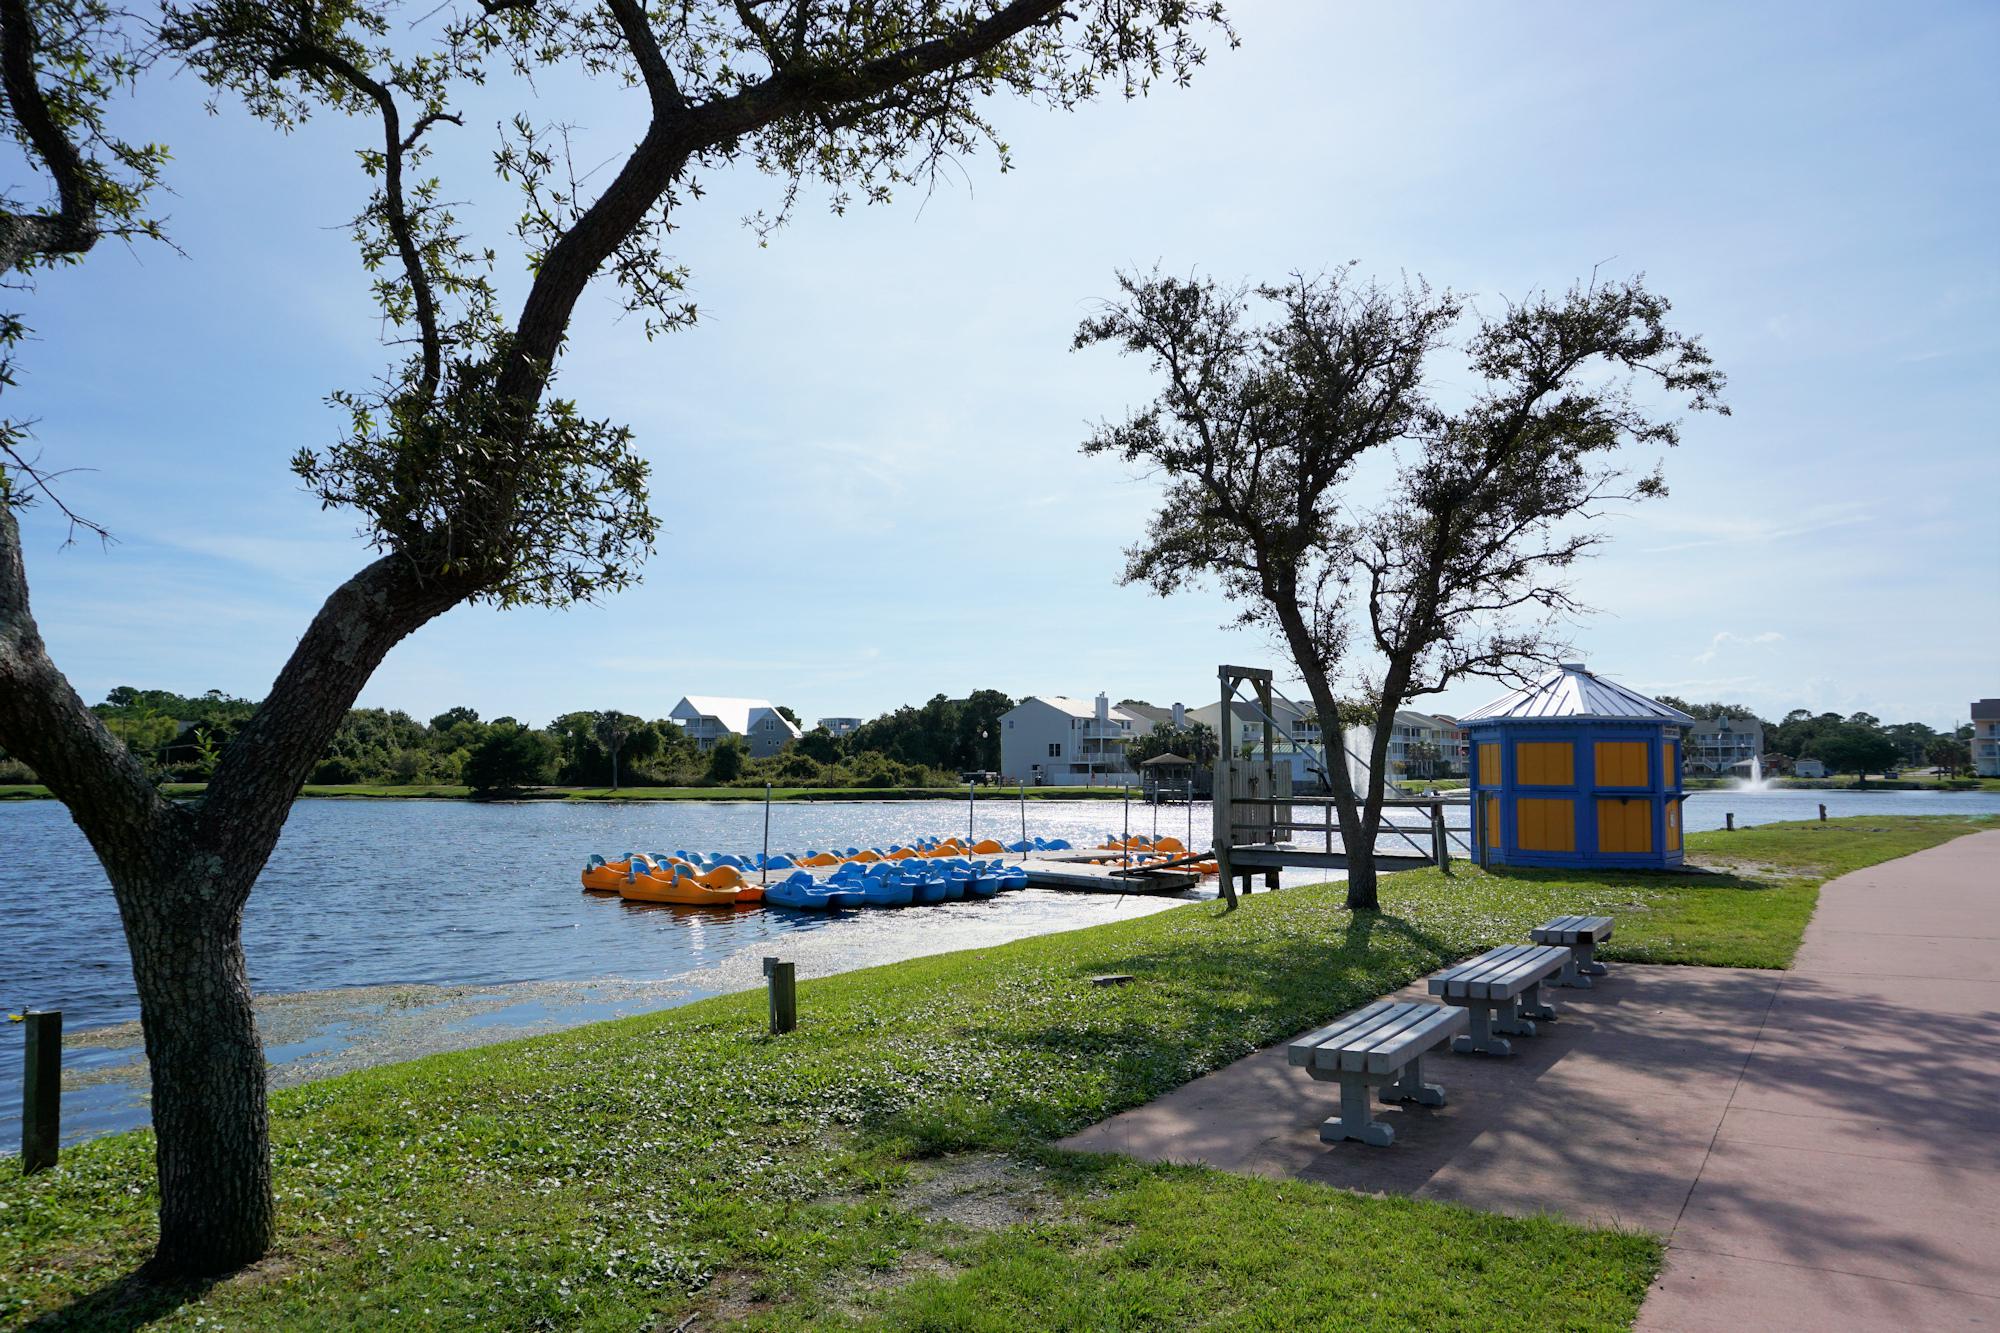 Pedal Boats/Paddle Boats